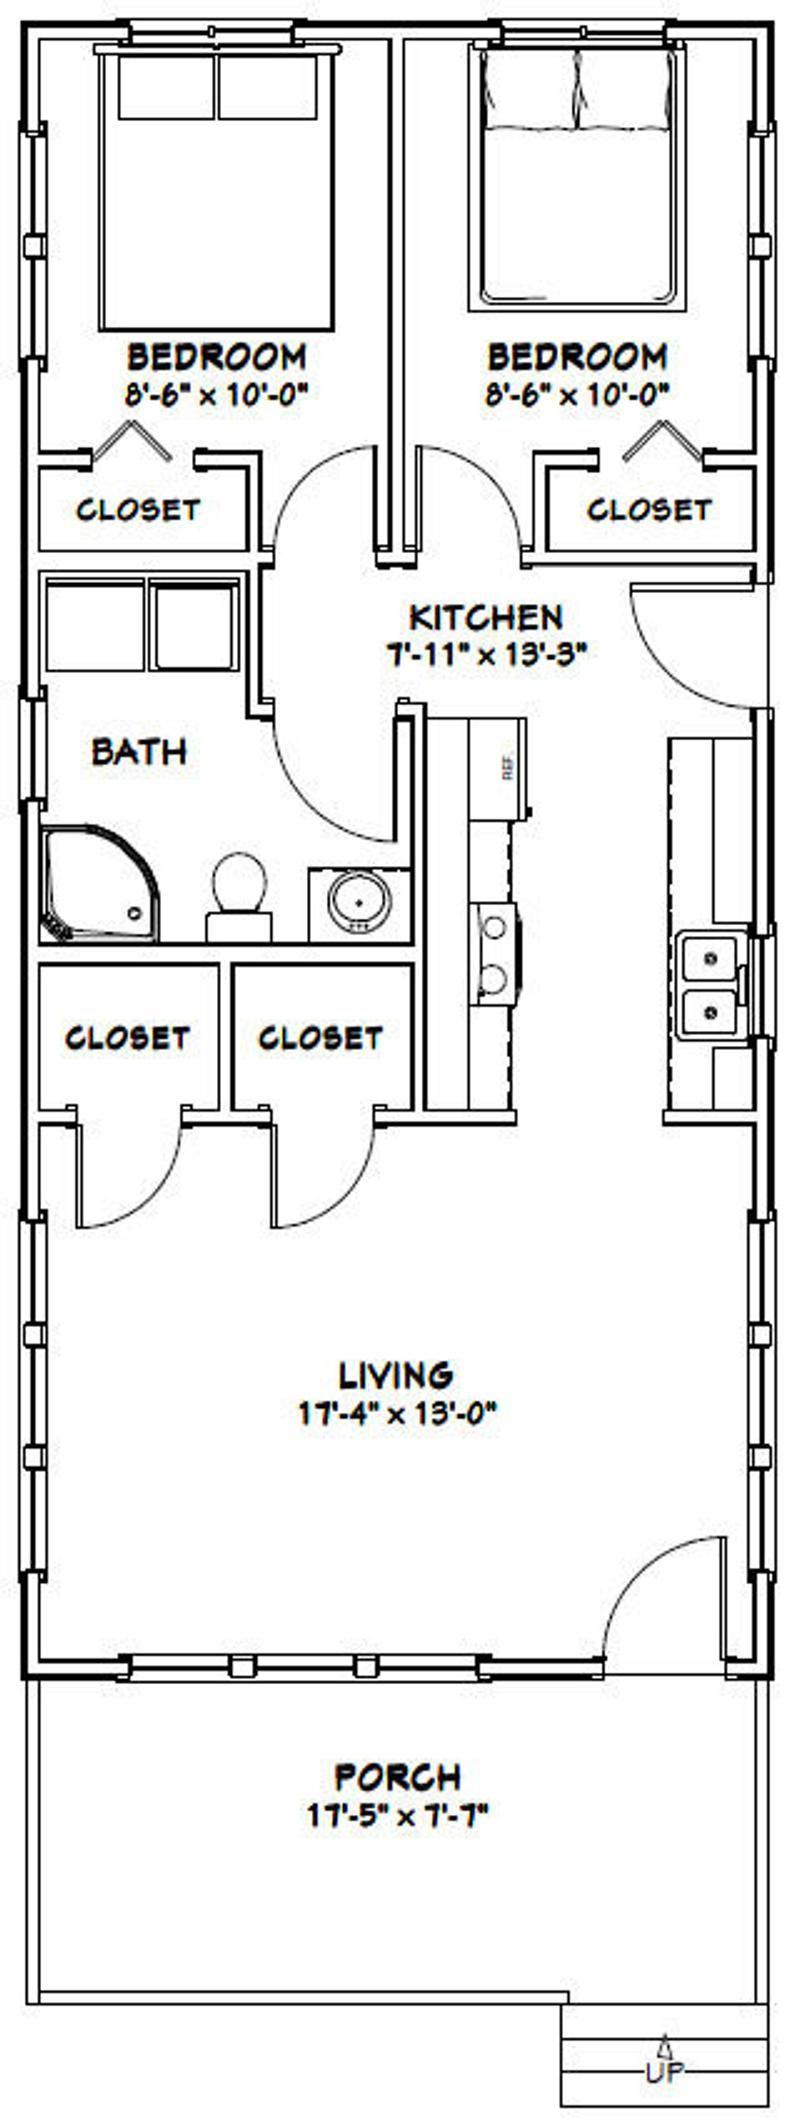 18x40 House 2Bedroom 1Bath 720 sq ft PDF Floor